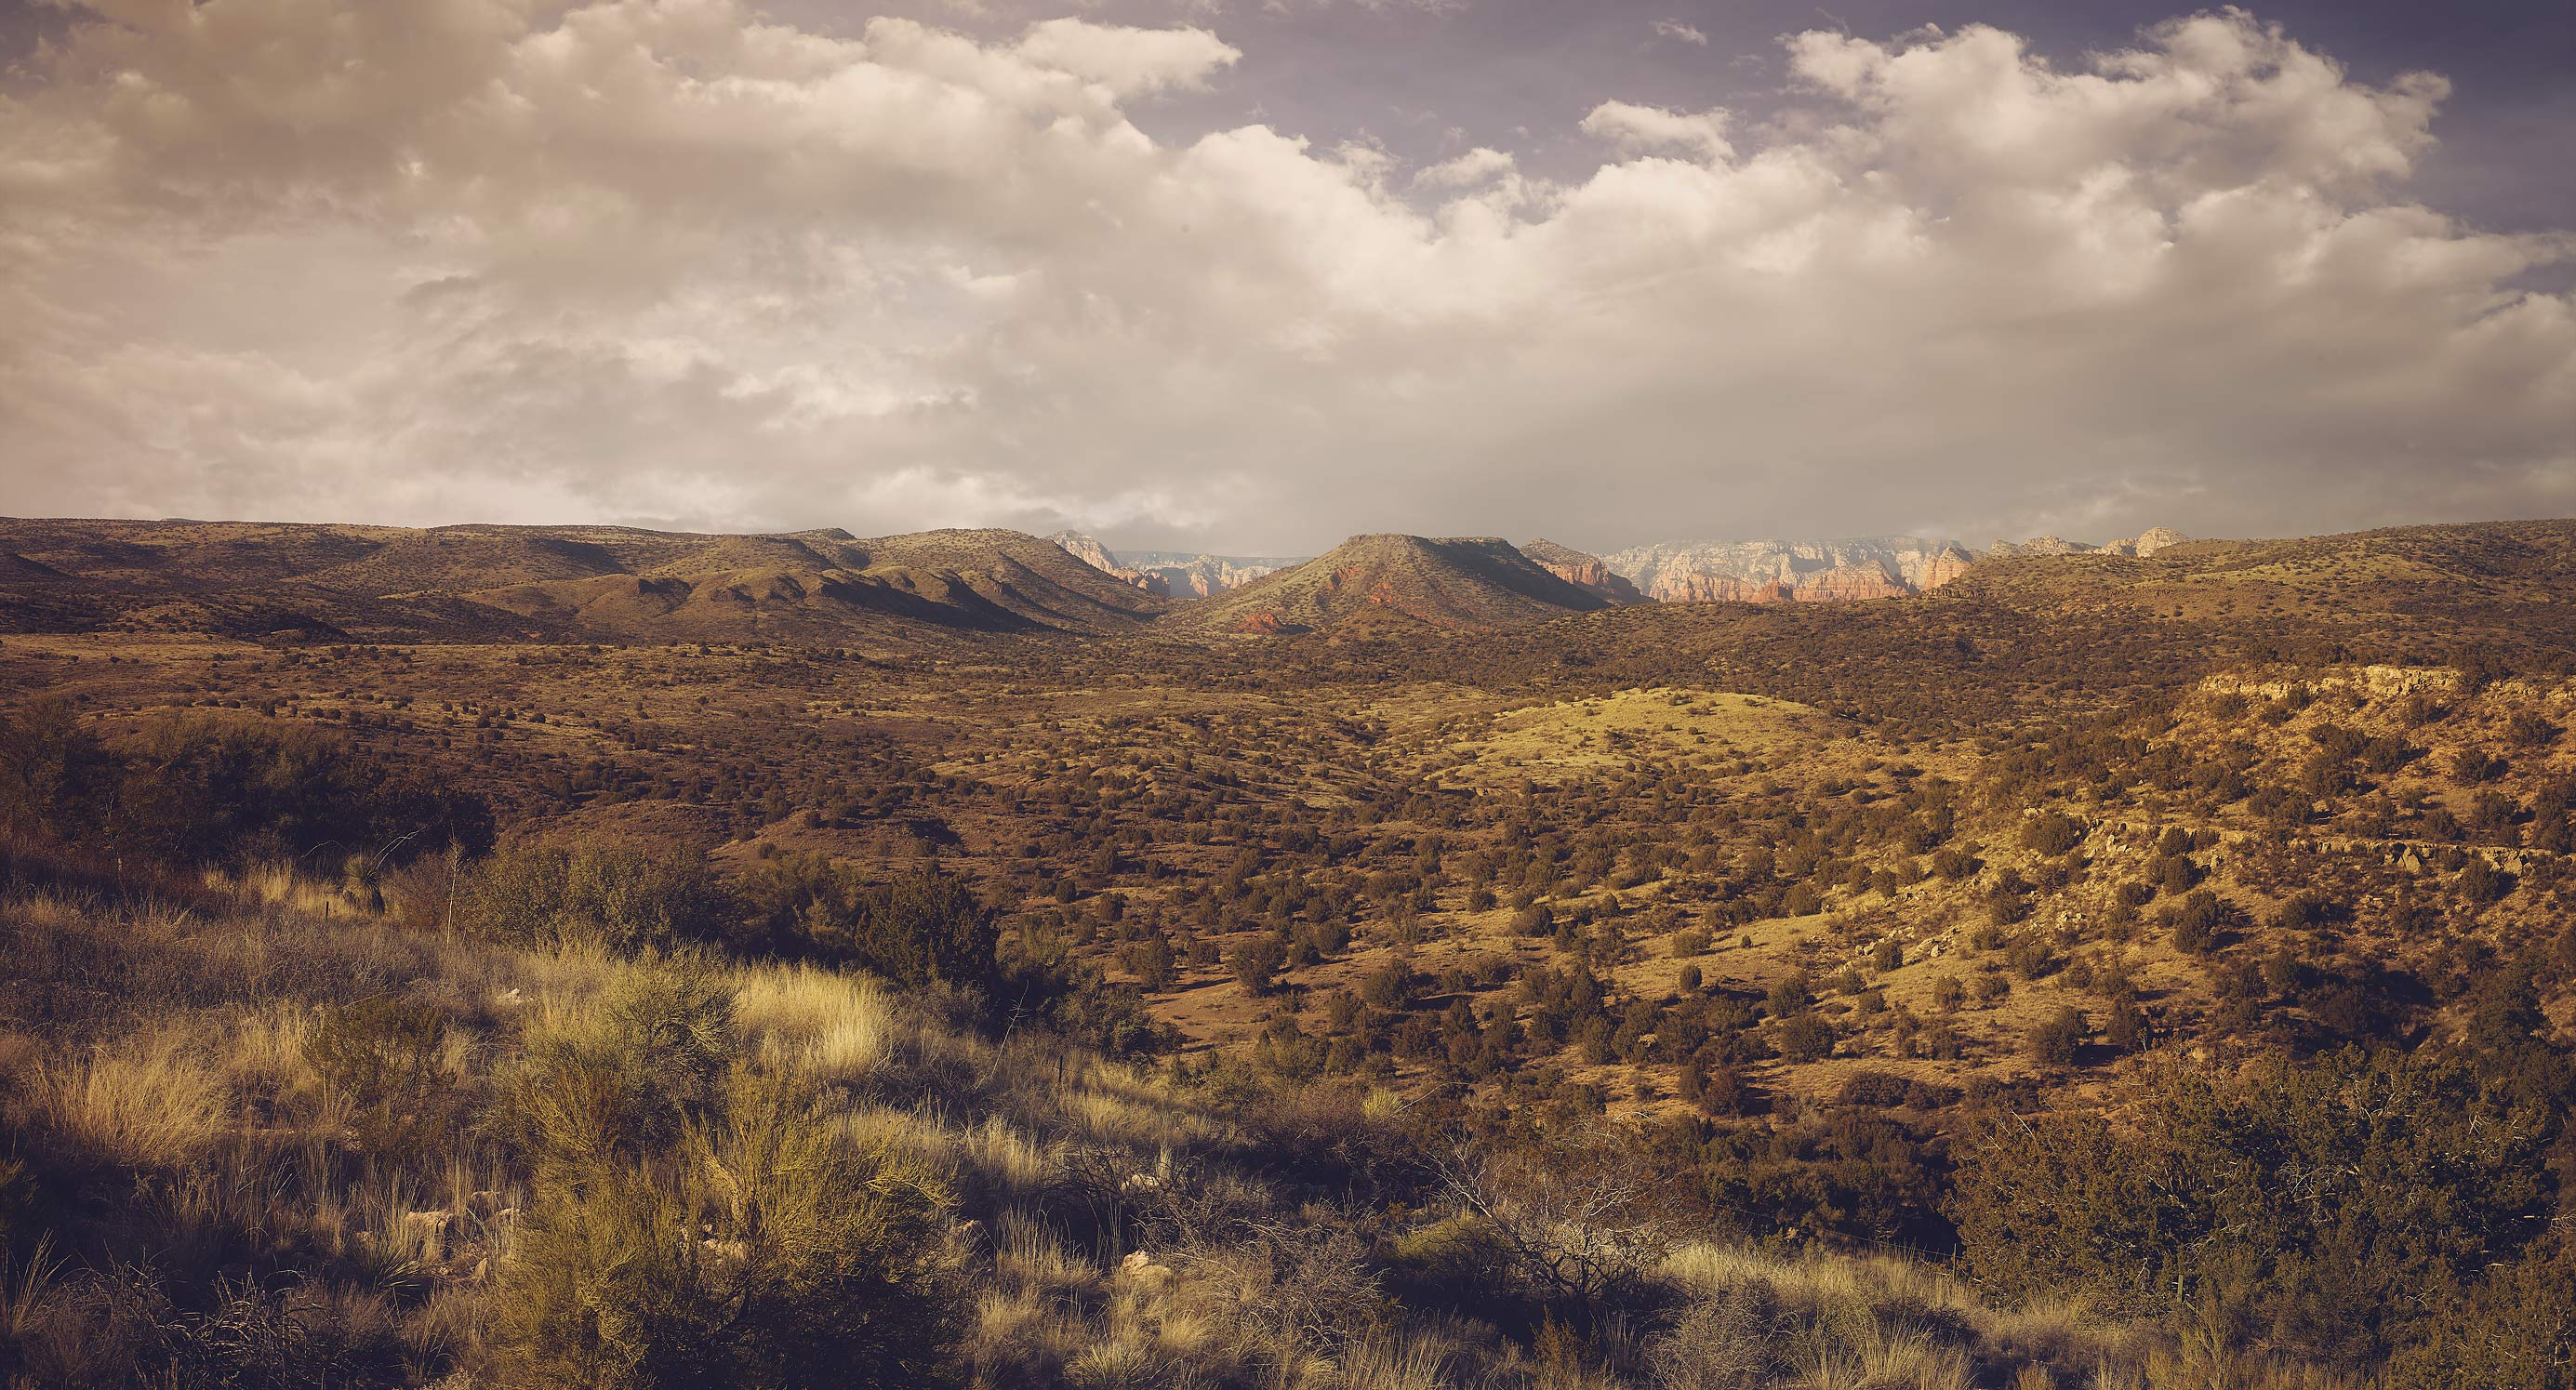 arizona landscape photography, arizona landscape photographer, phoenix landscape photographer, landscape photos of arizona, photos of sedona, oak creek canyon, southwest photographer, arizona photographer, phoenix photographer